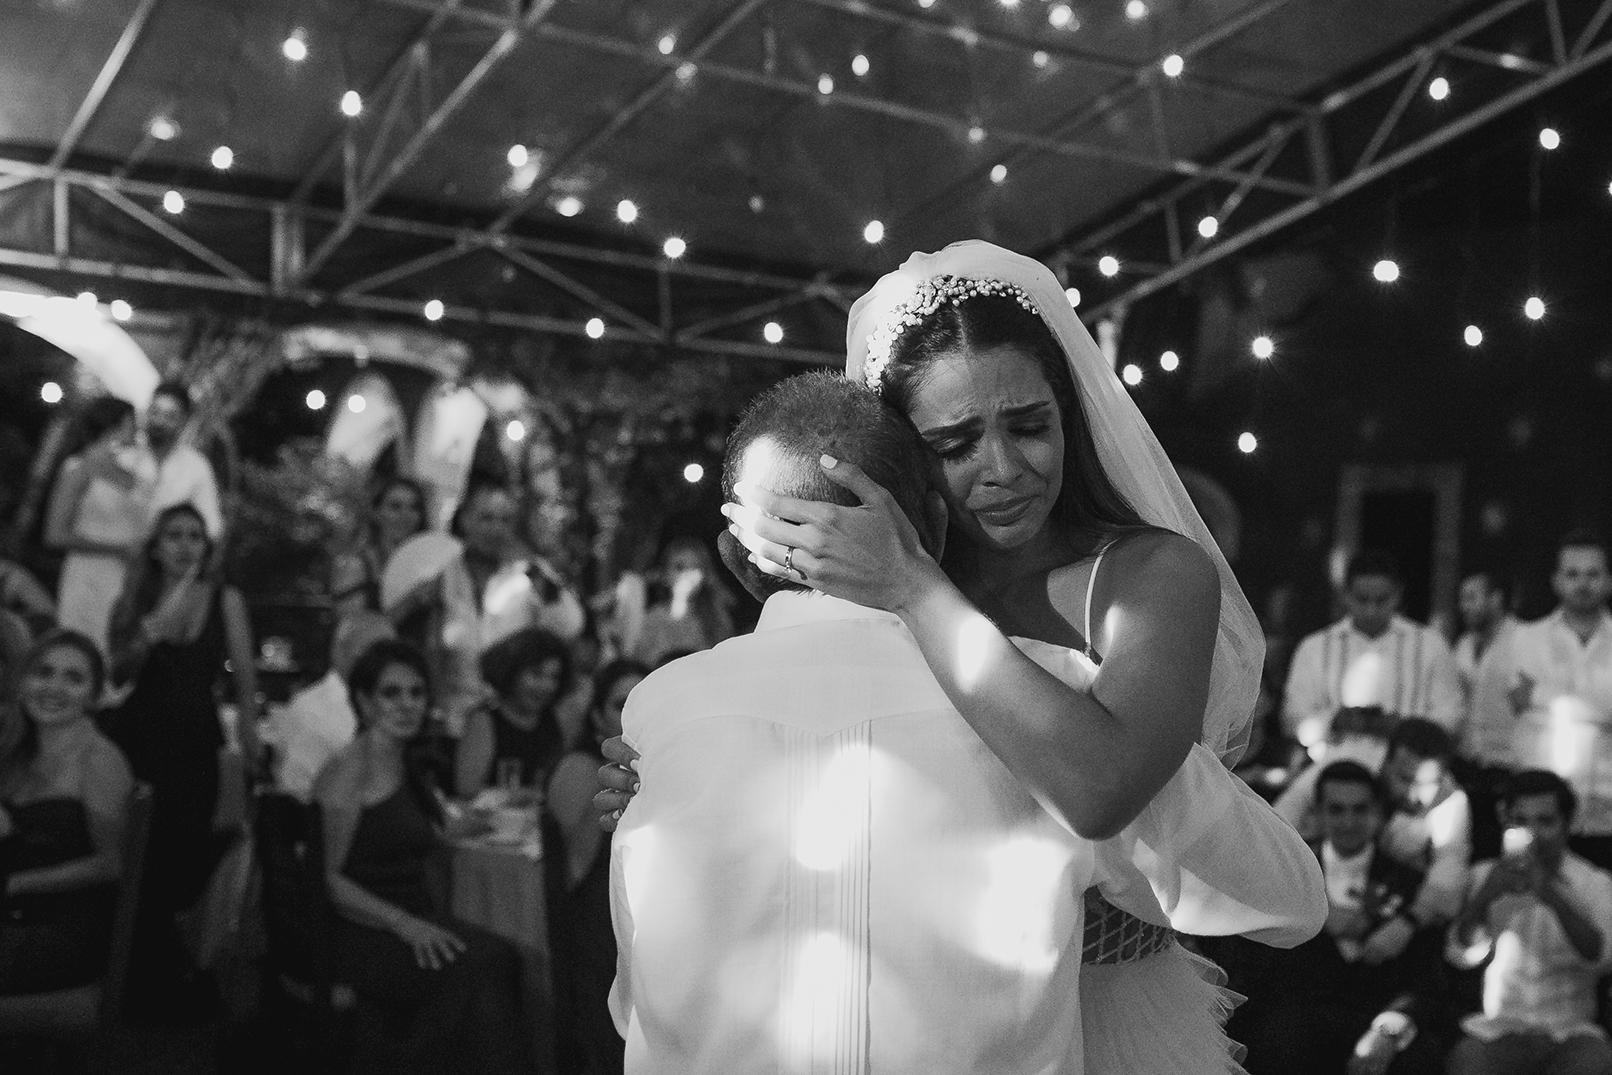 1080R&F__WeddingDestination_Weddingmerida_BodaMexico_FotografoDeBodas_FabrizioSimoneenFotografo.jpg